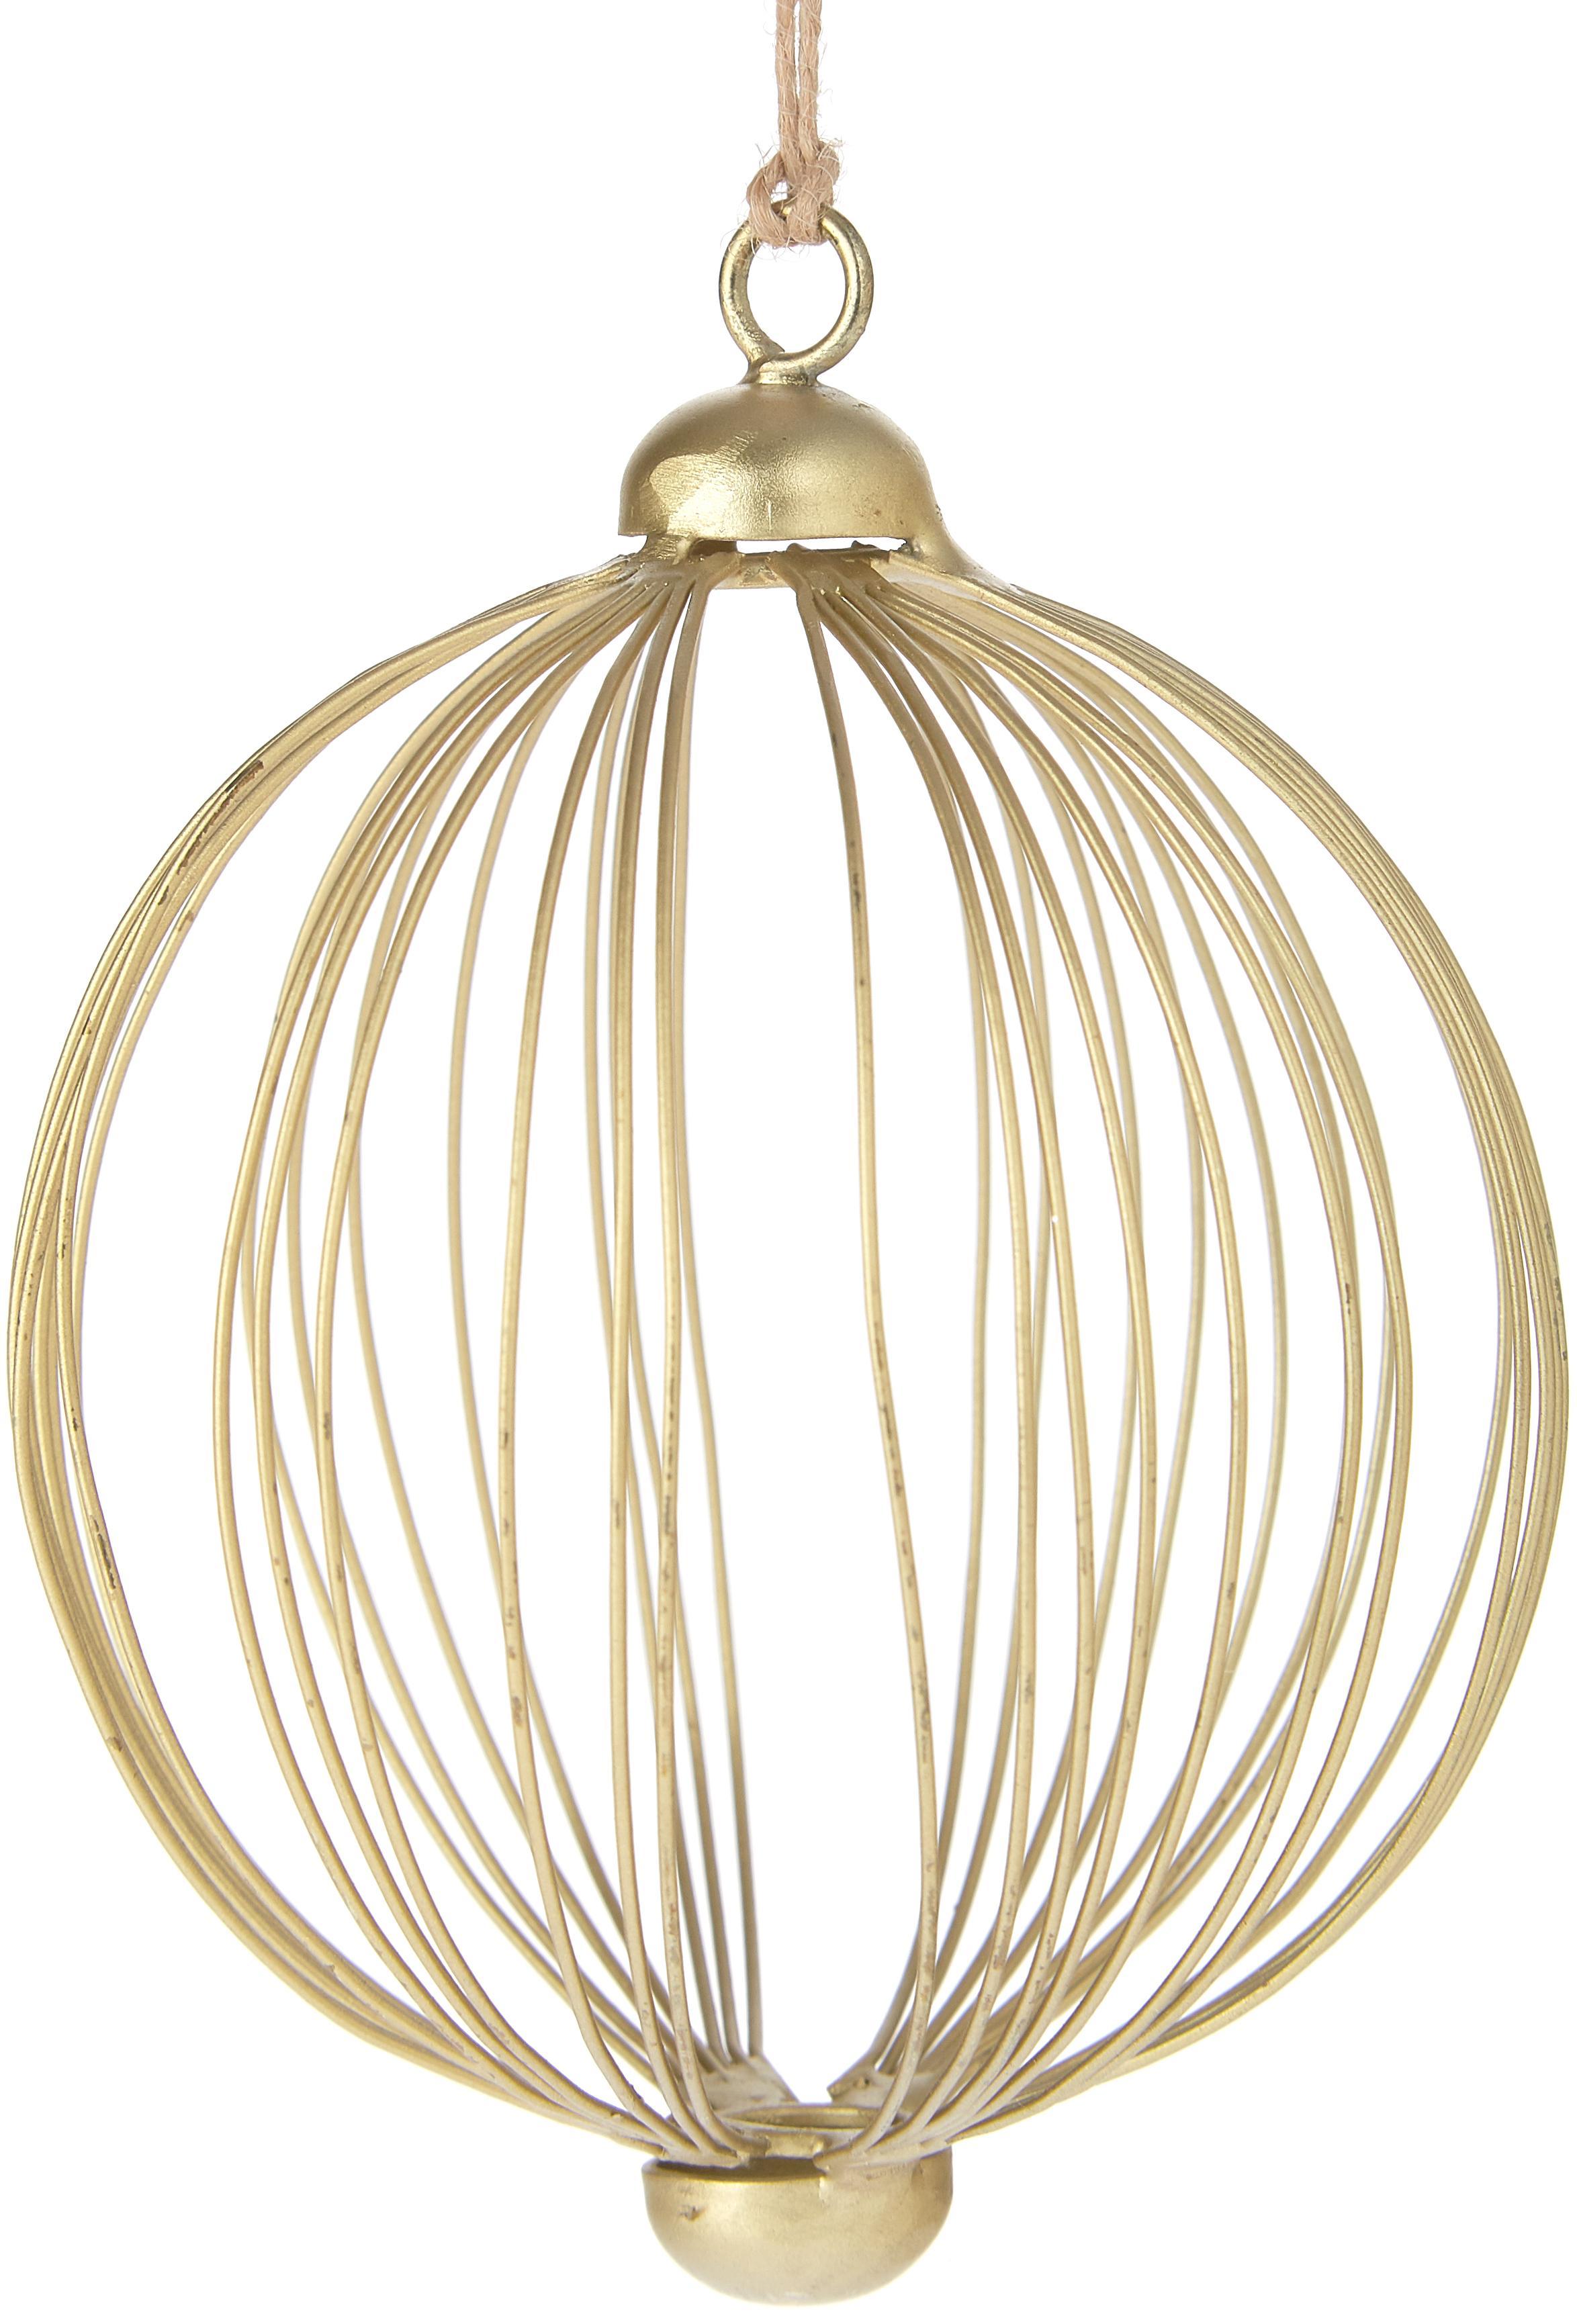 Kerstboomhangers Twine, 2 stuks, Gelakt metaal, Goudkleurig, Ø 10 cm